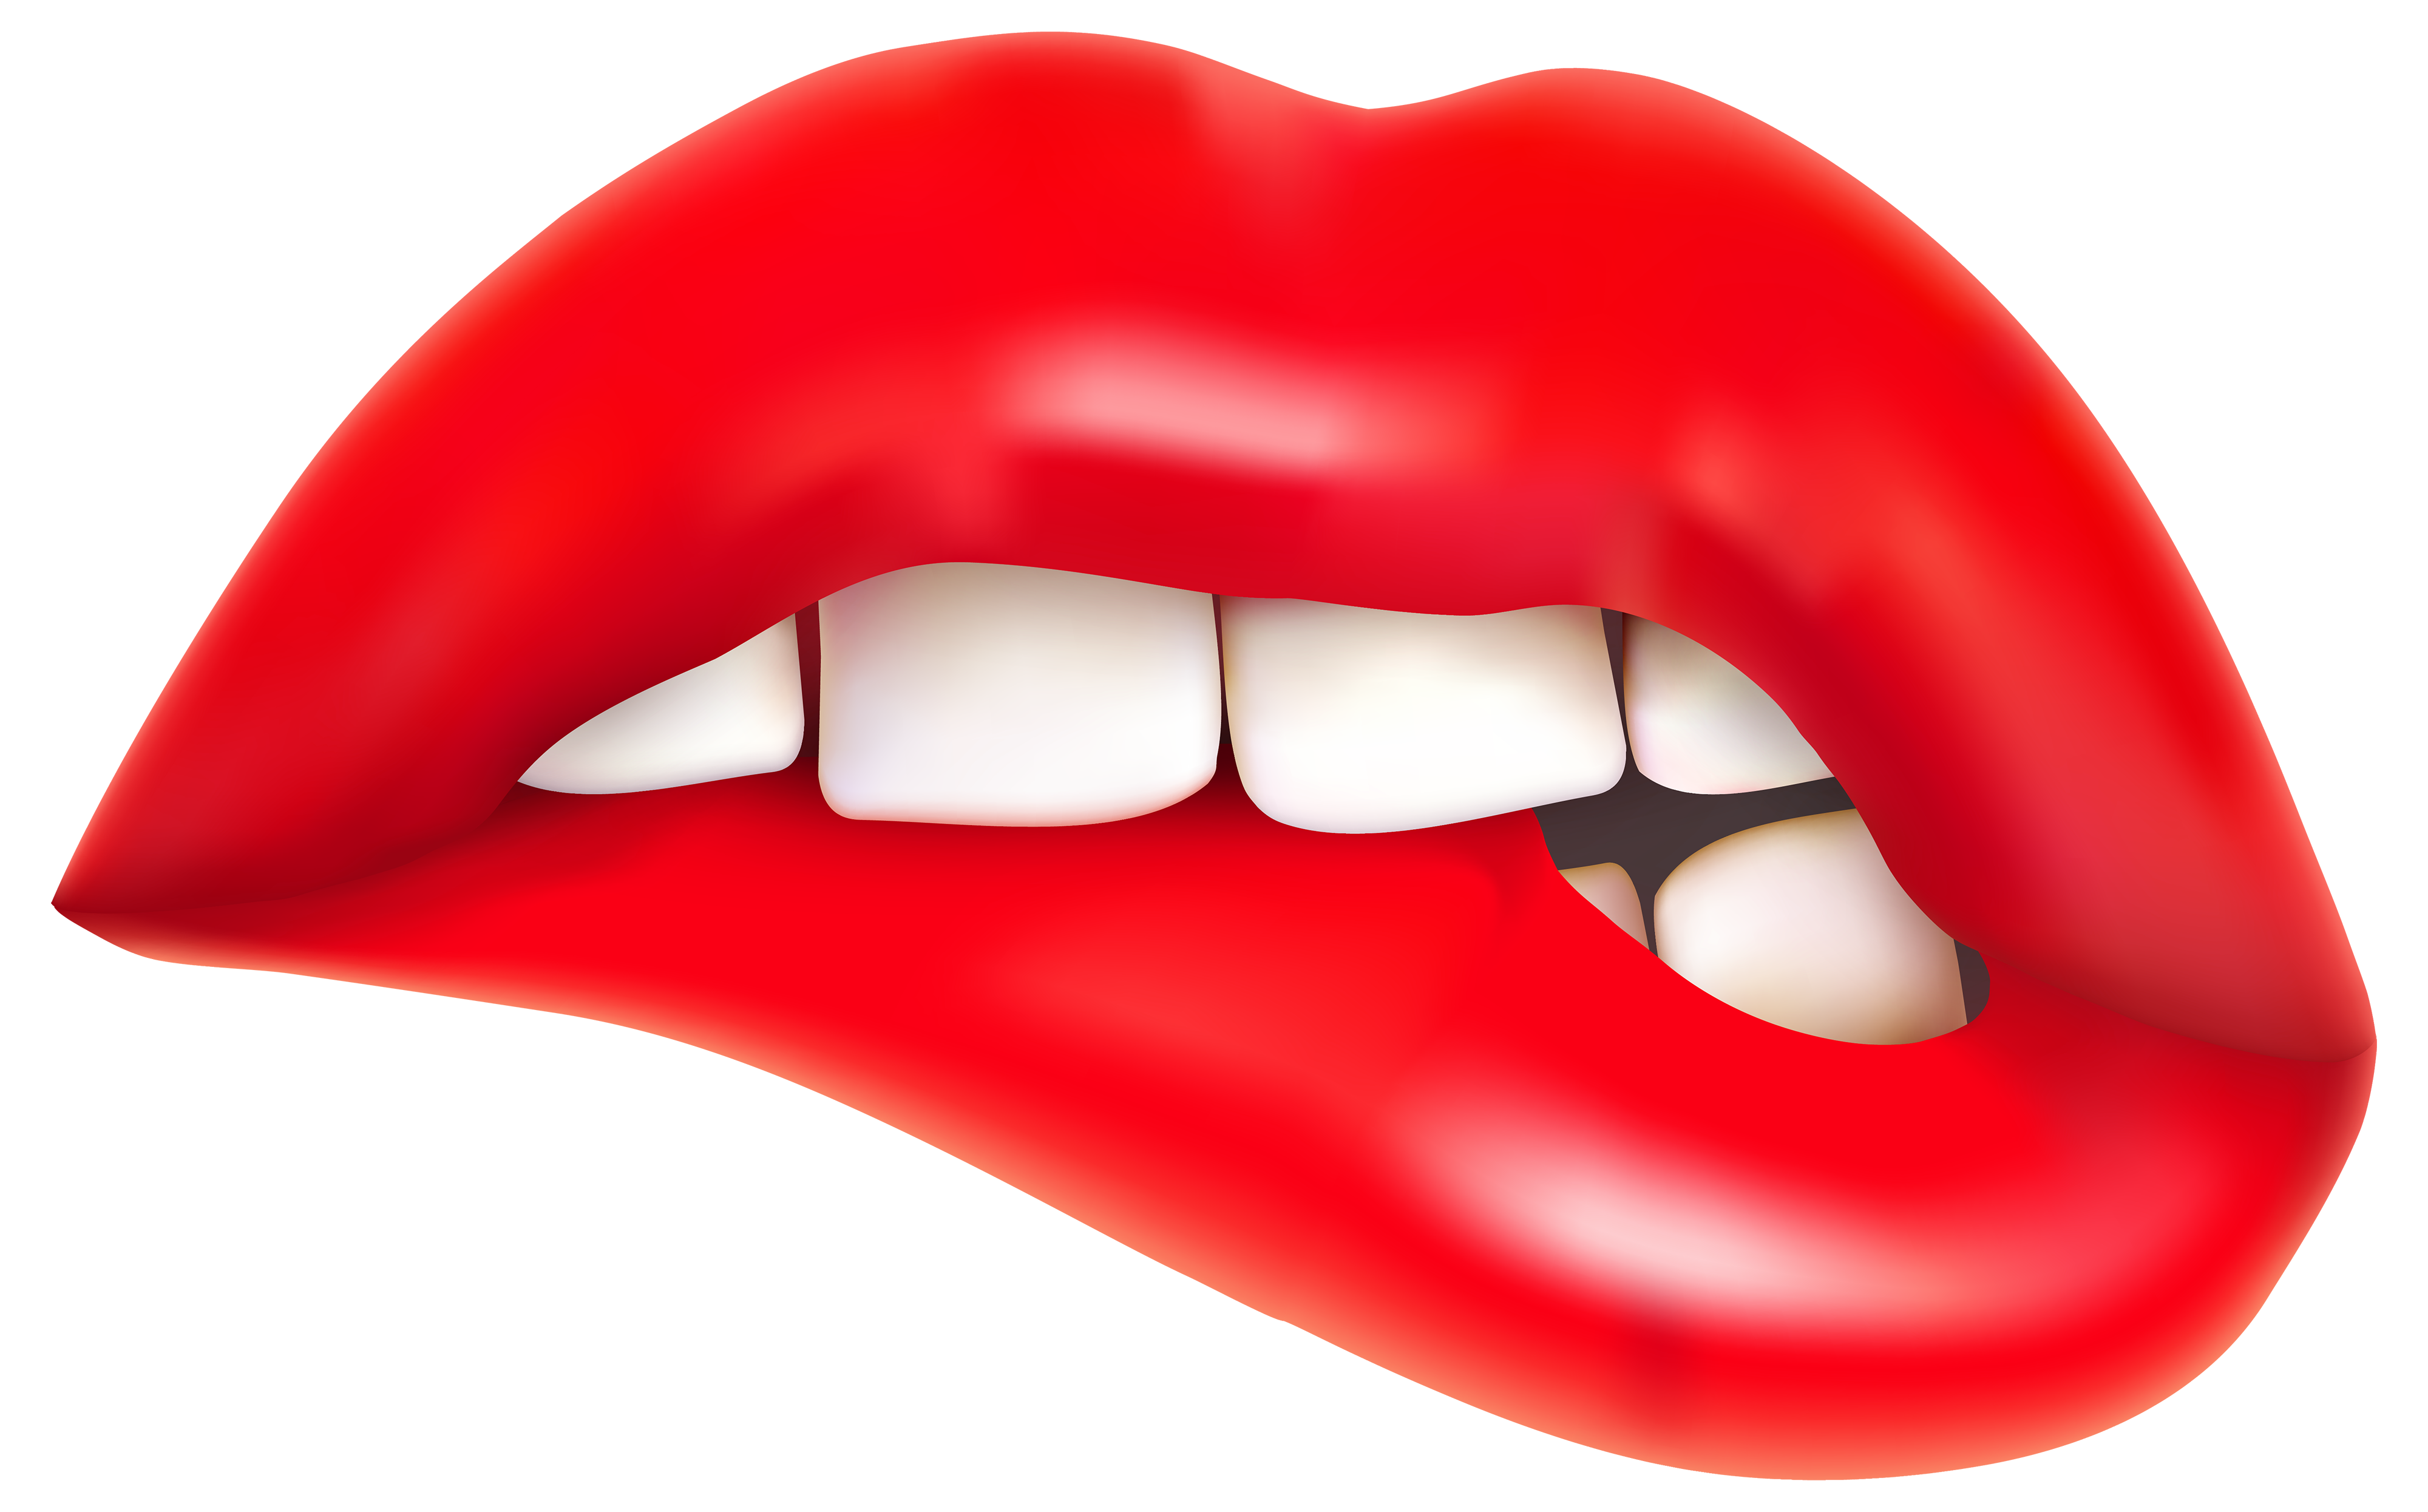 lips clipart clipground Funny Lips Clip Art Funny Lips Clip Art